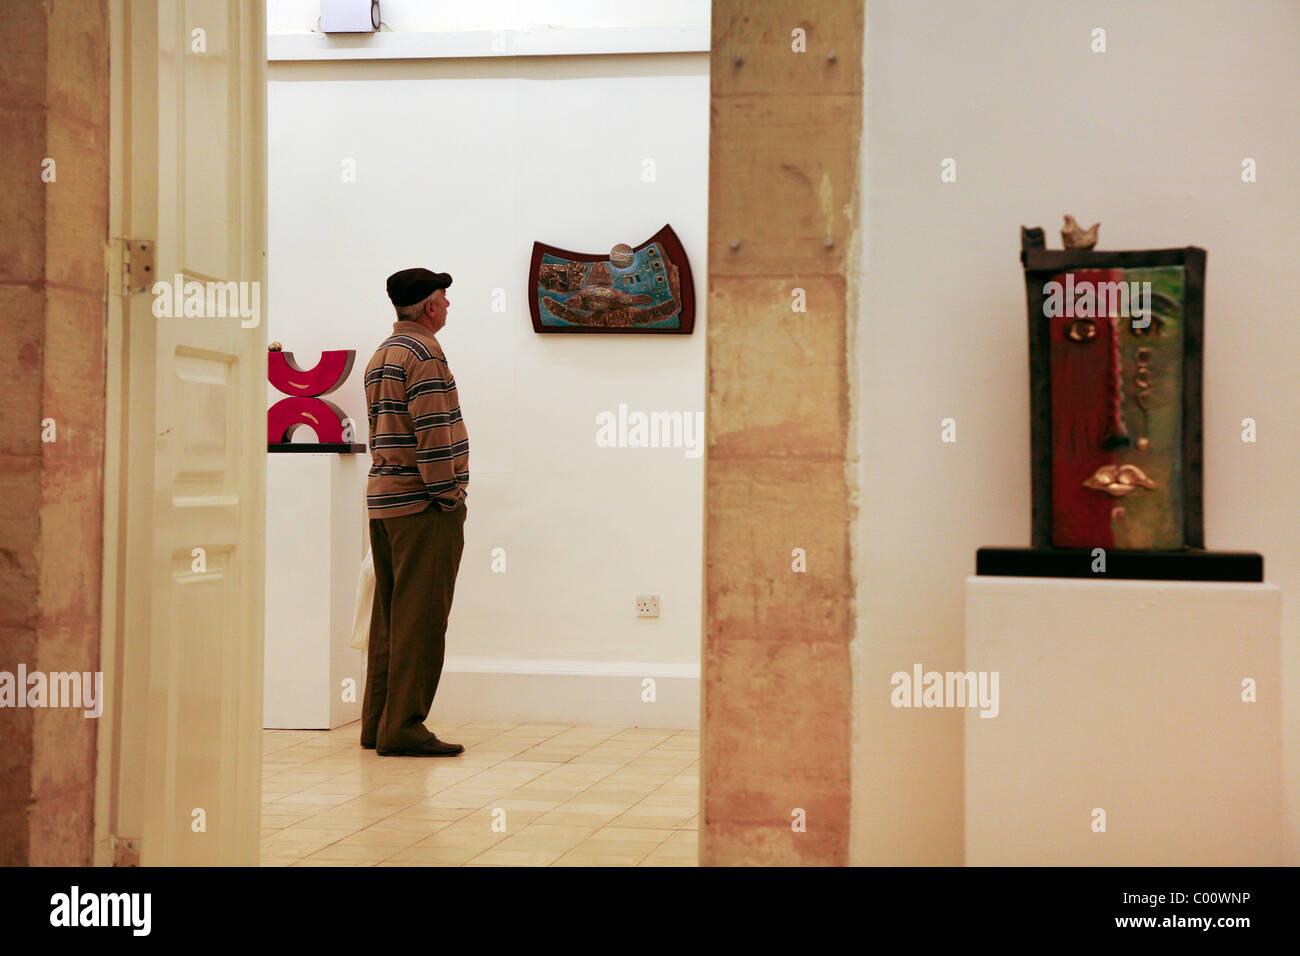 Darat Al Funun art gallery, Amman, Jordan. - Stock Image